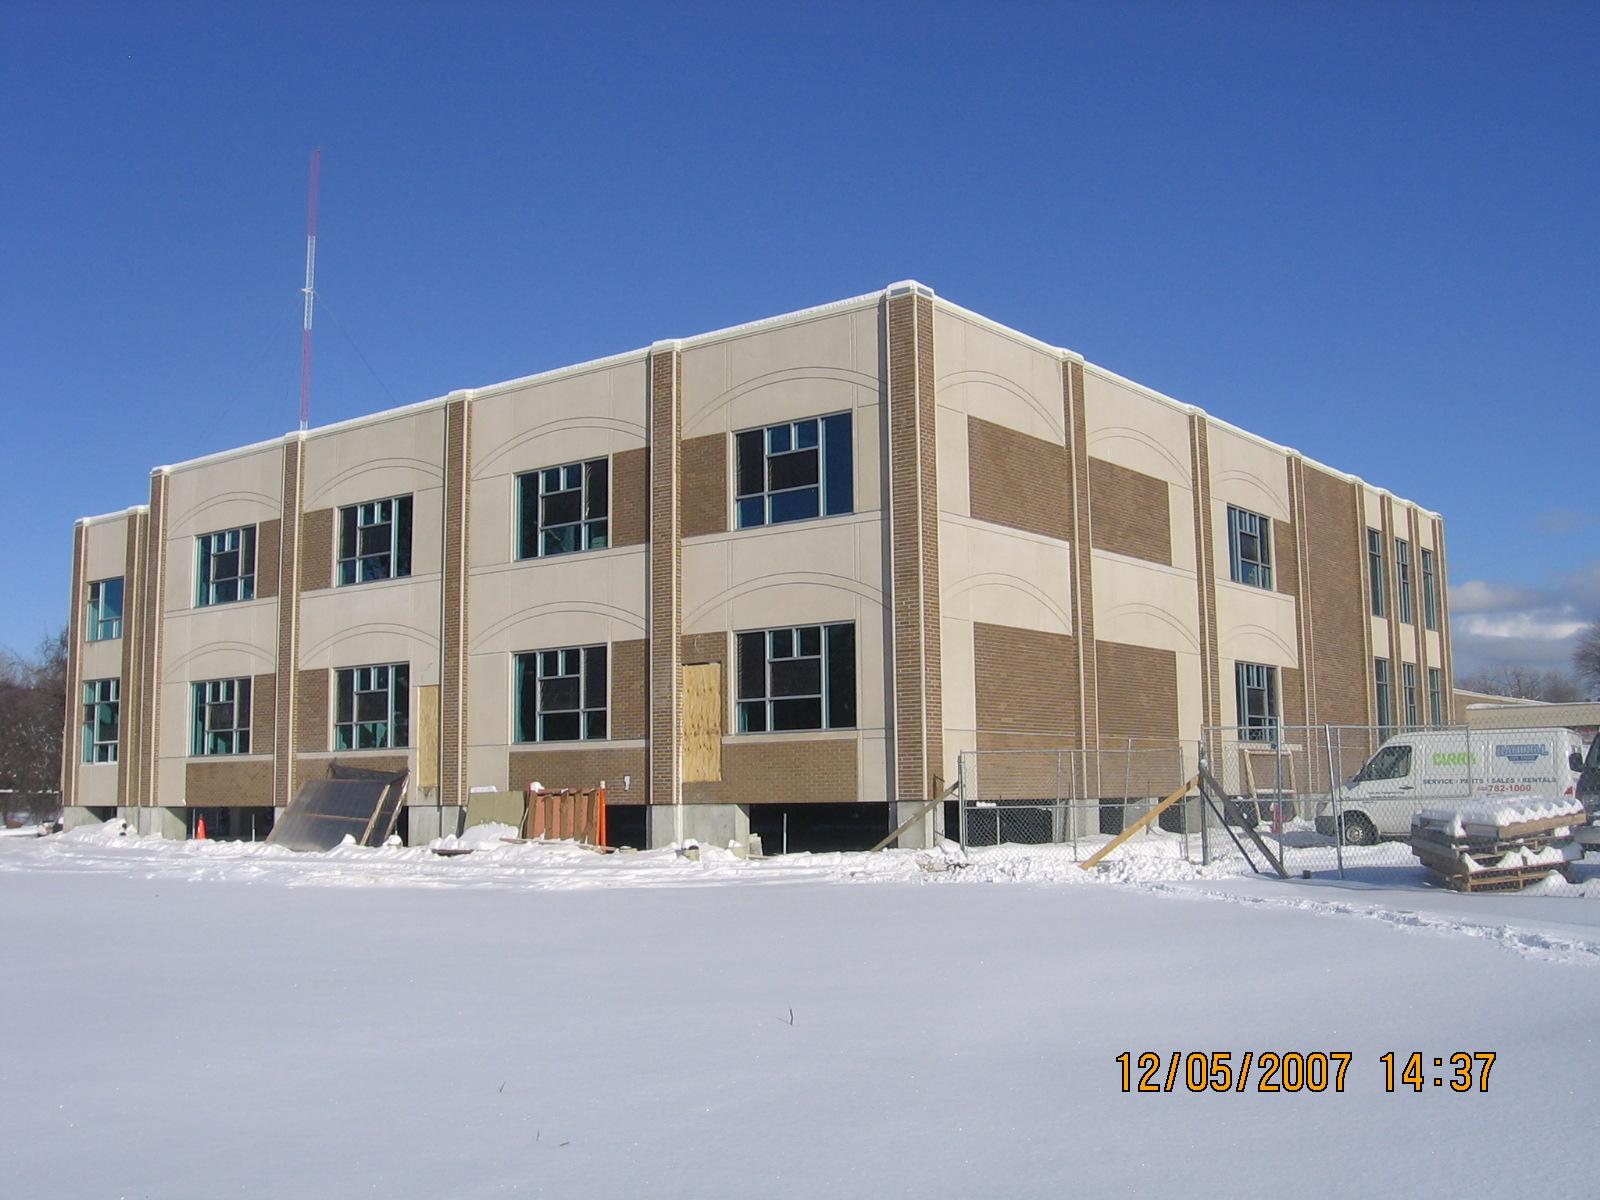 2007, December 9